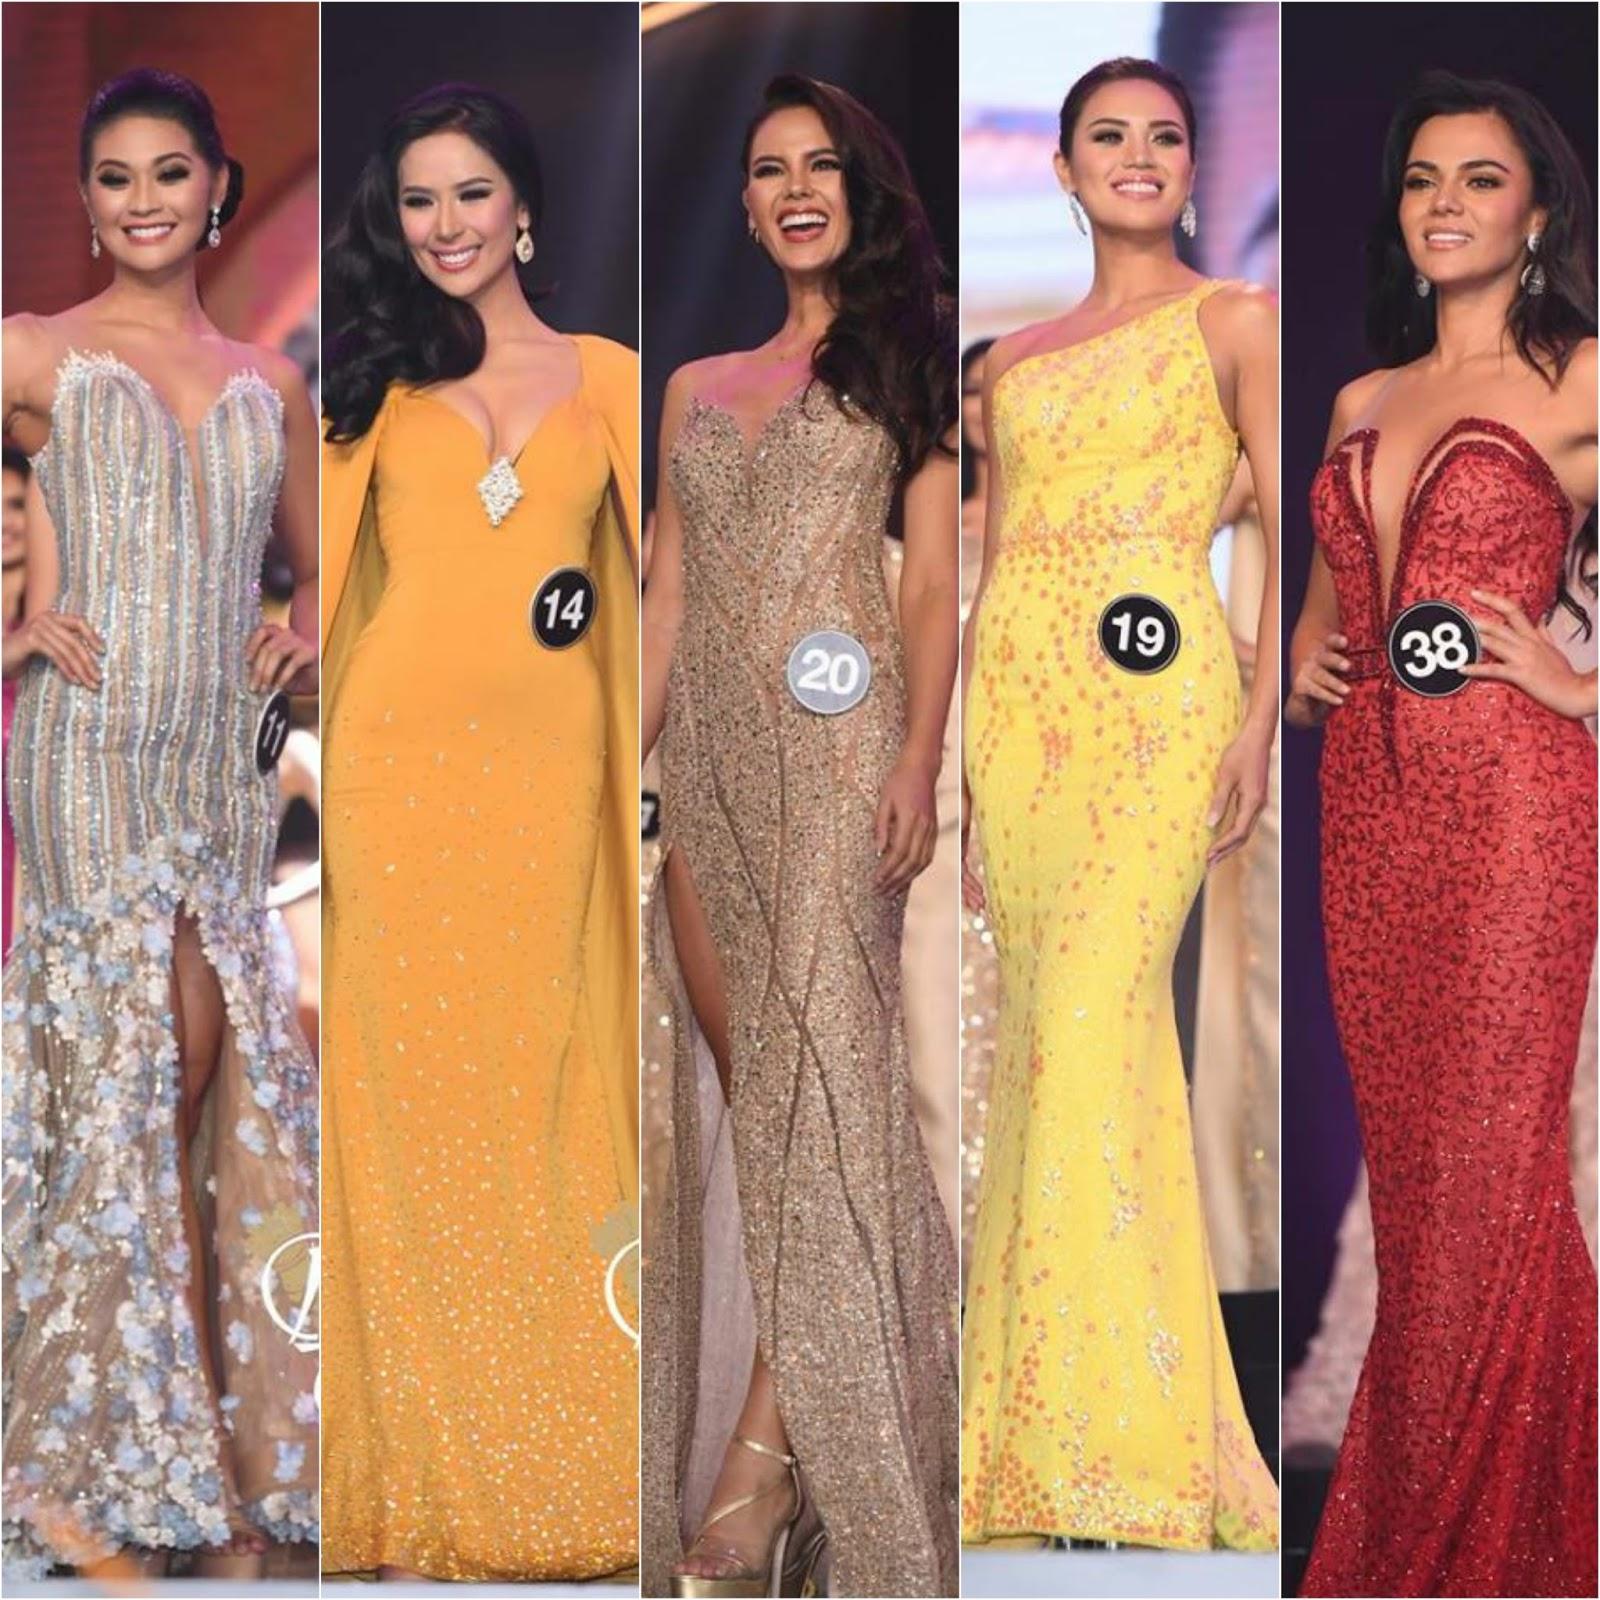 SASHES AND TIARAS     Binibining Pilipinas 2018 Finals